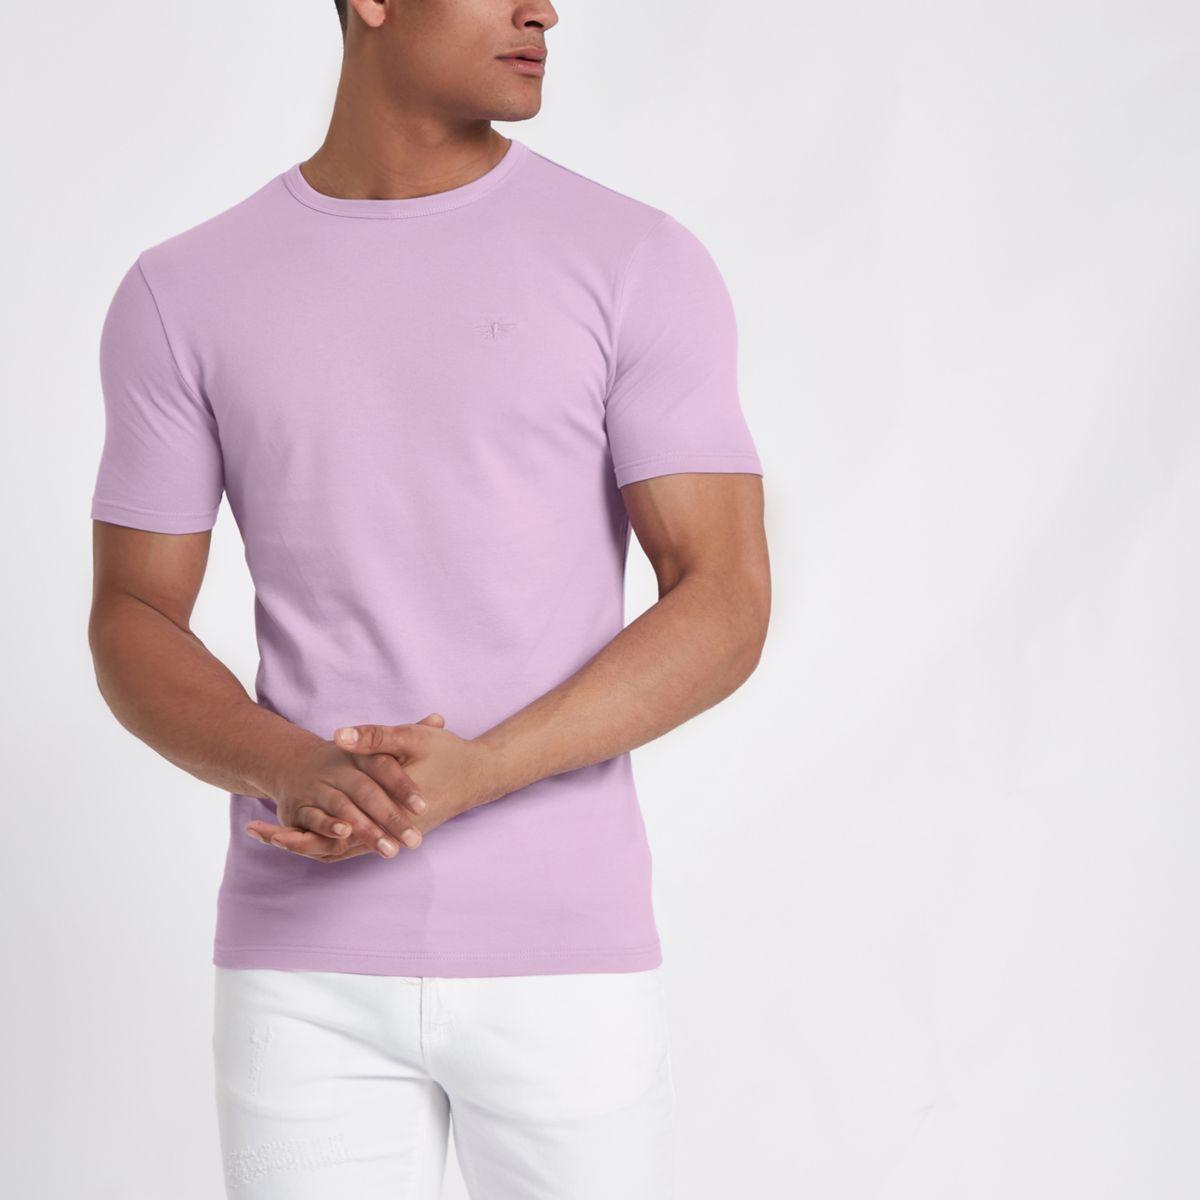 Besticktes Muscle Fit T-Shirt in Flieder